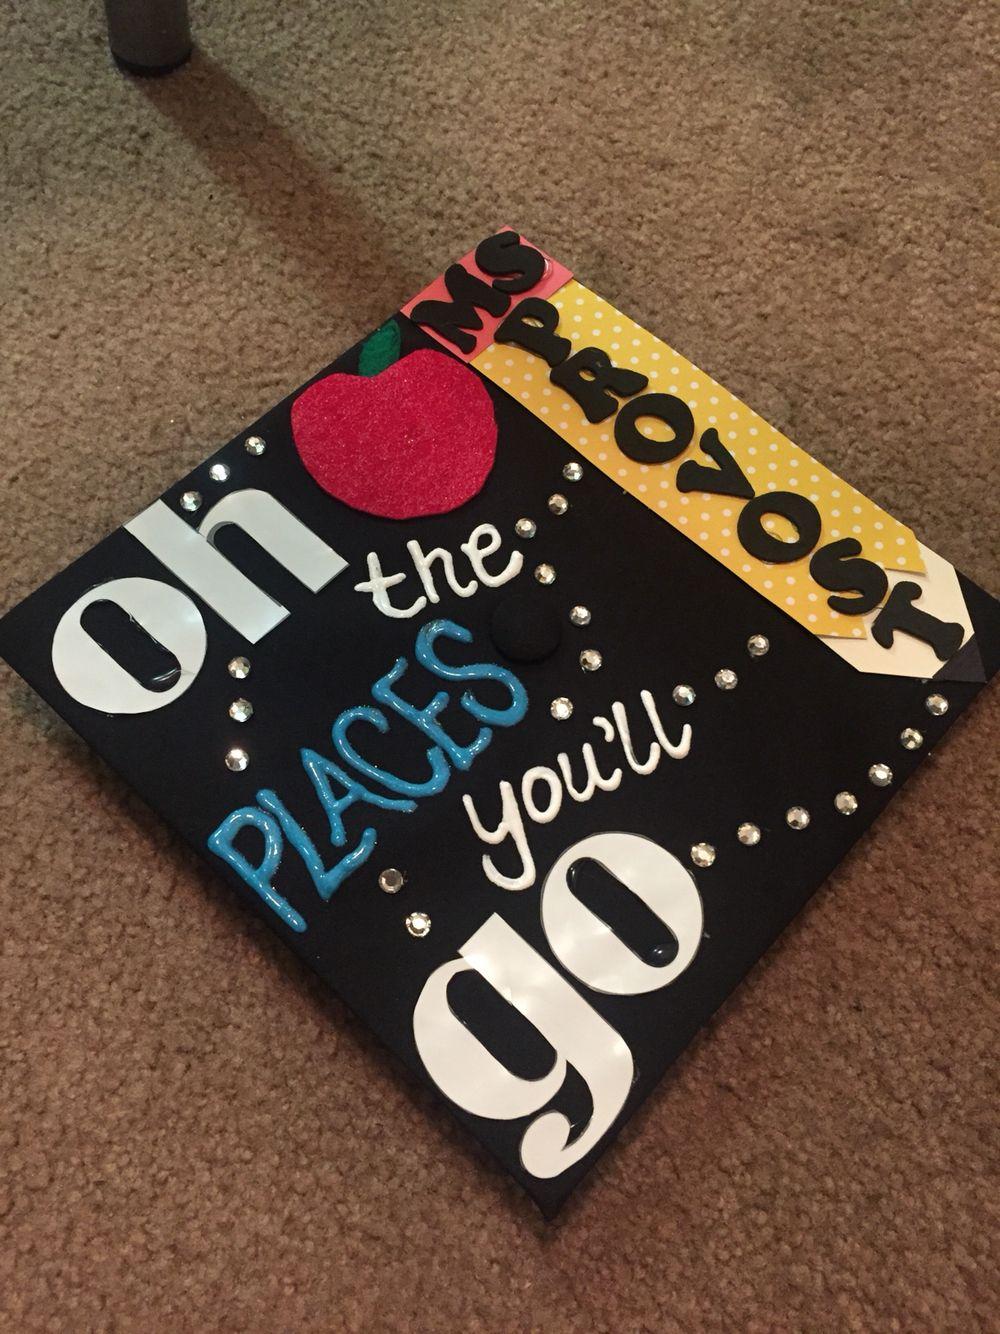 Decorating graduation cap ideas for teachers - Dr Suess Teacher Graduation Cap Gradcap Teacher Drsuess